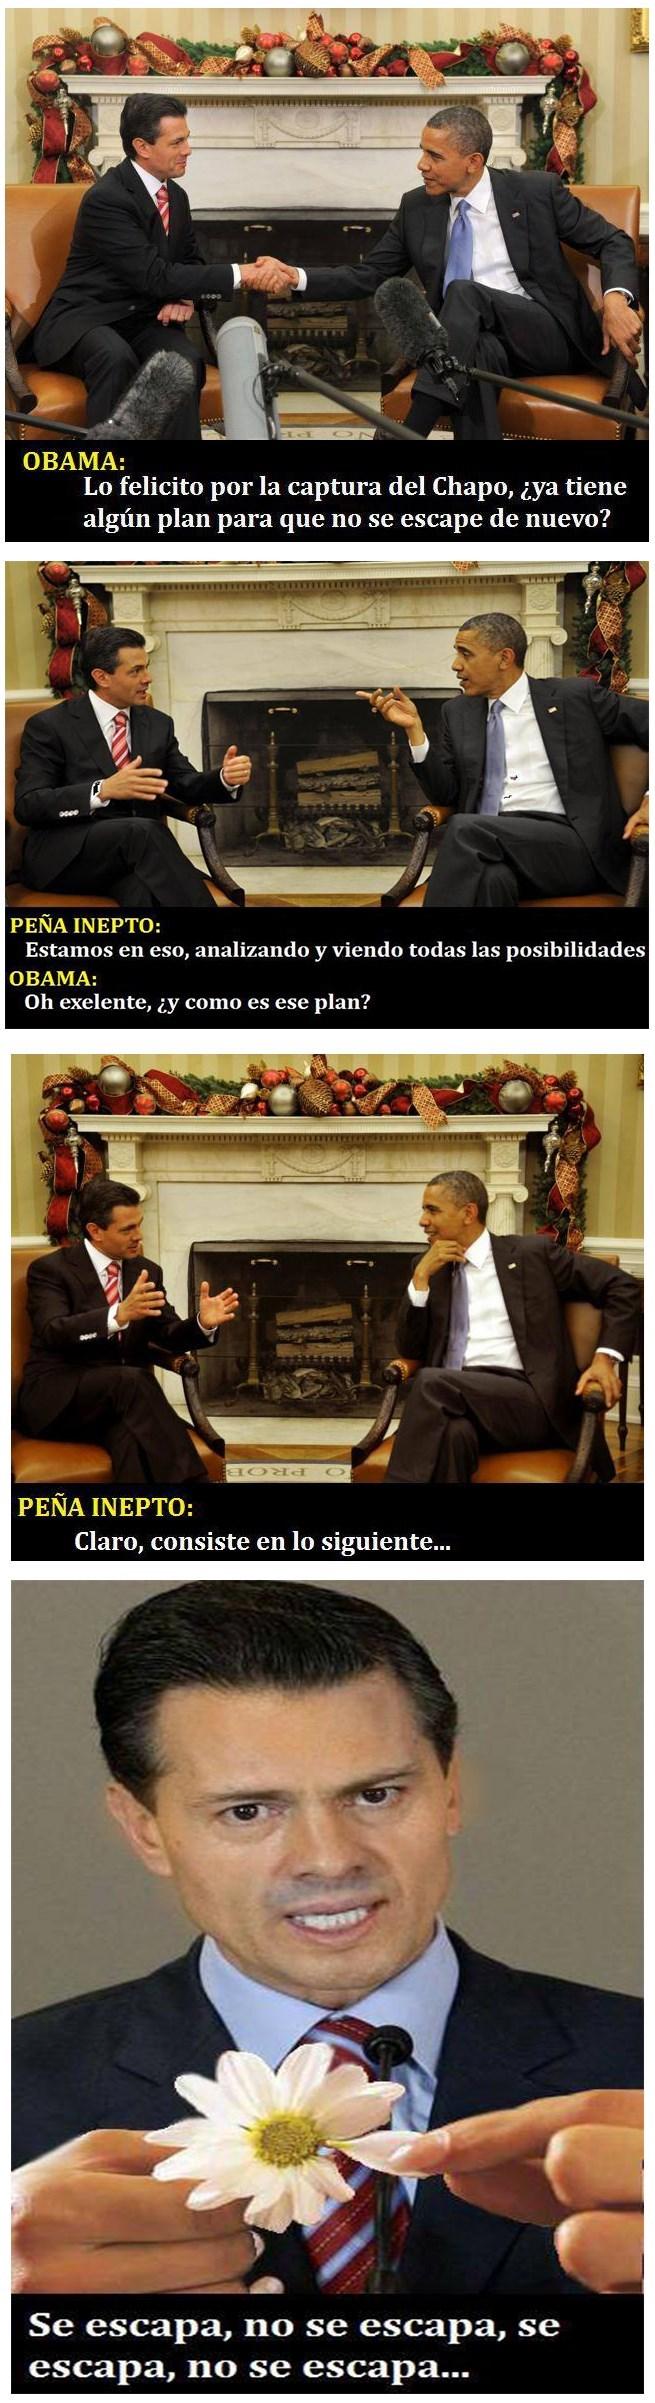 entrevista obama